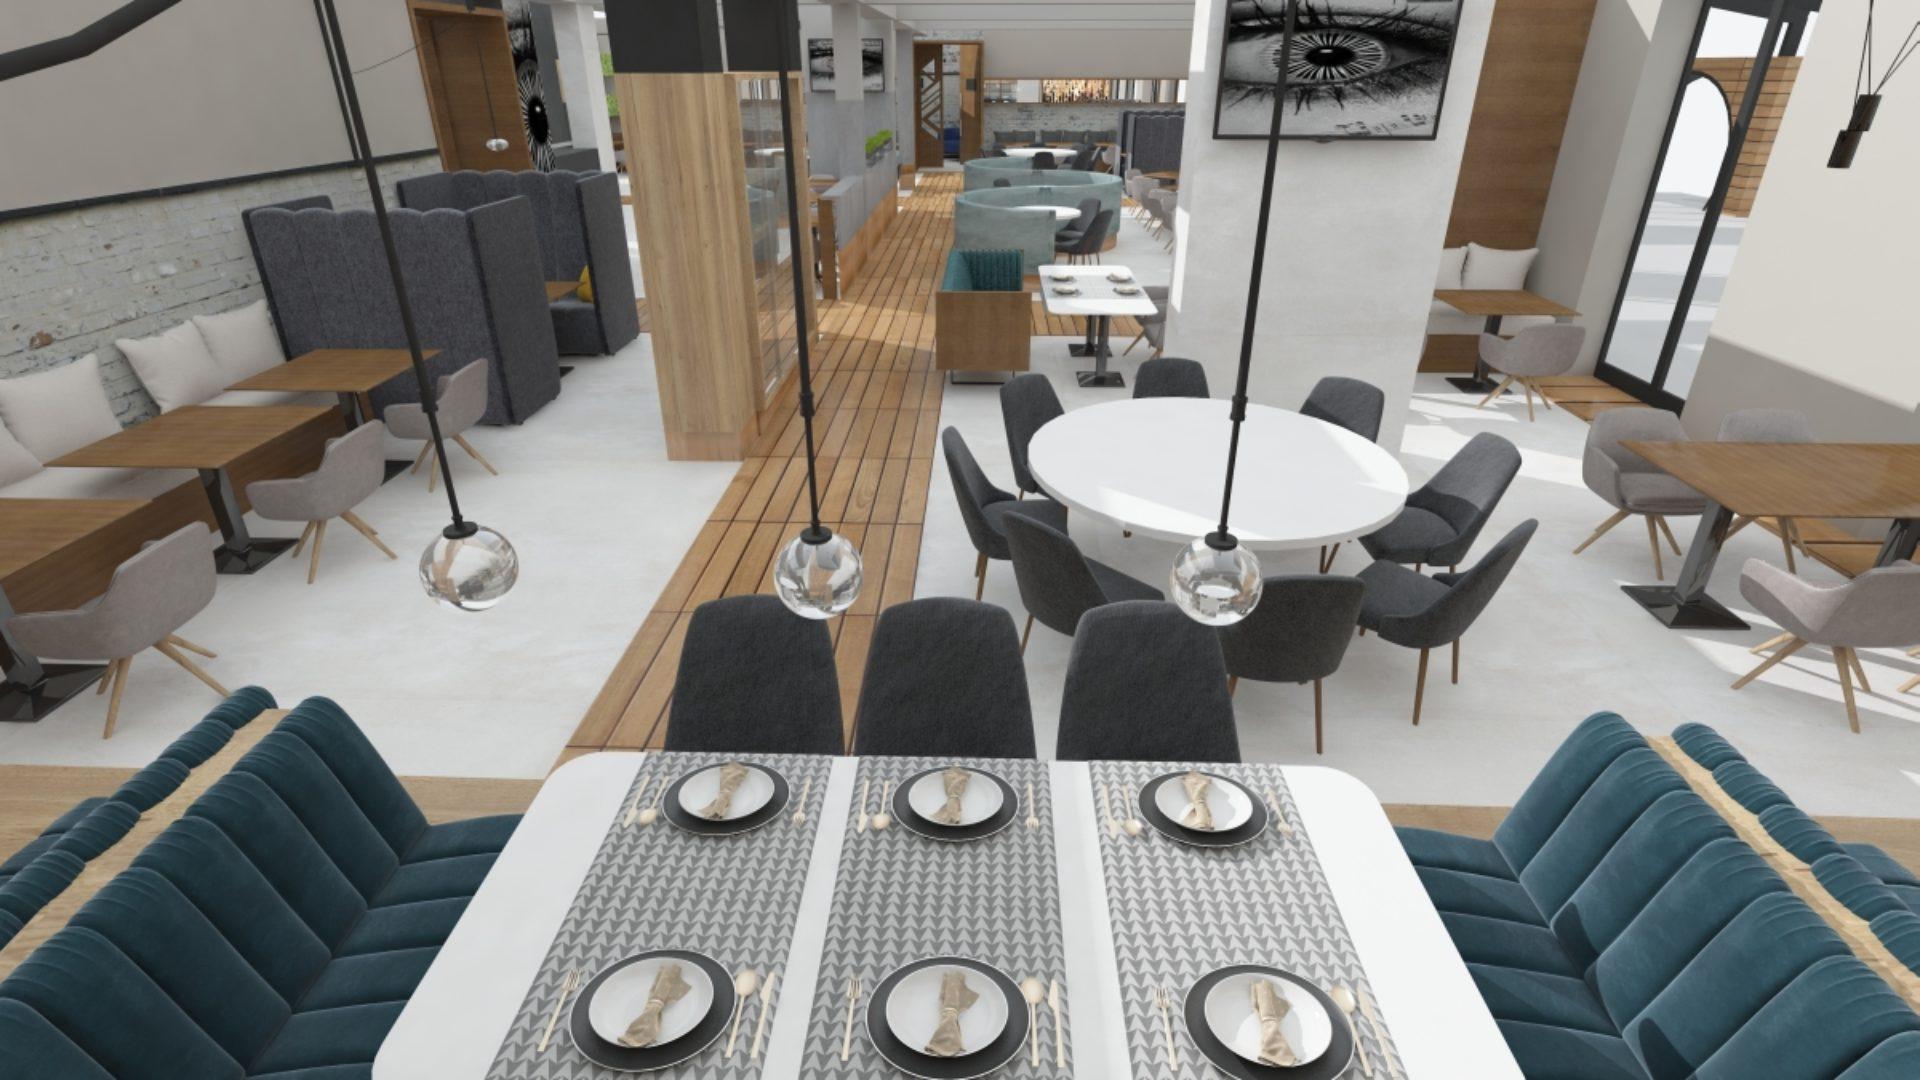 Ресторант Маркони Павел баня